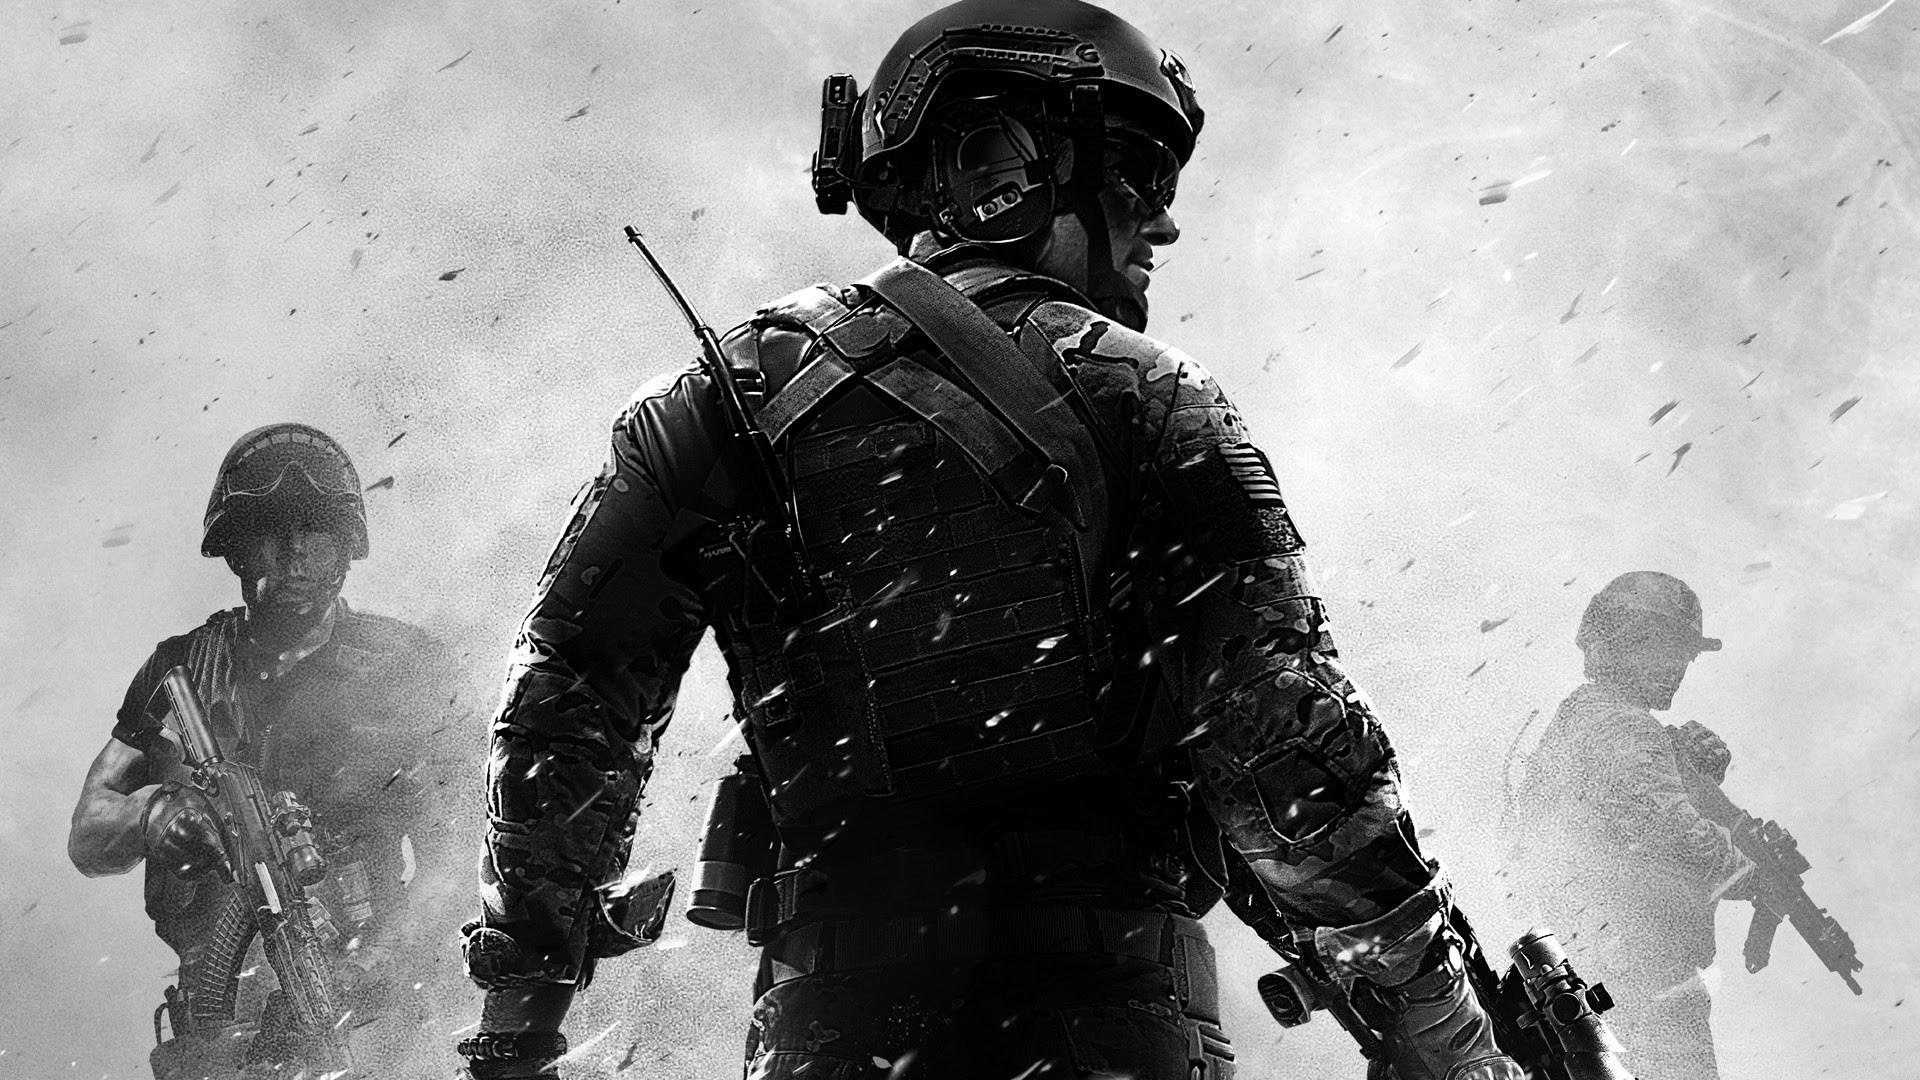 Call Of Duty Wallpaper 1920x1080 42714